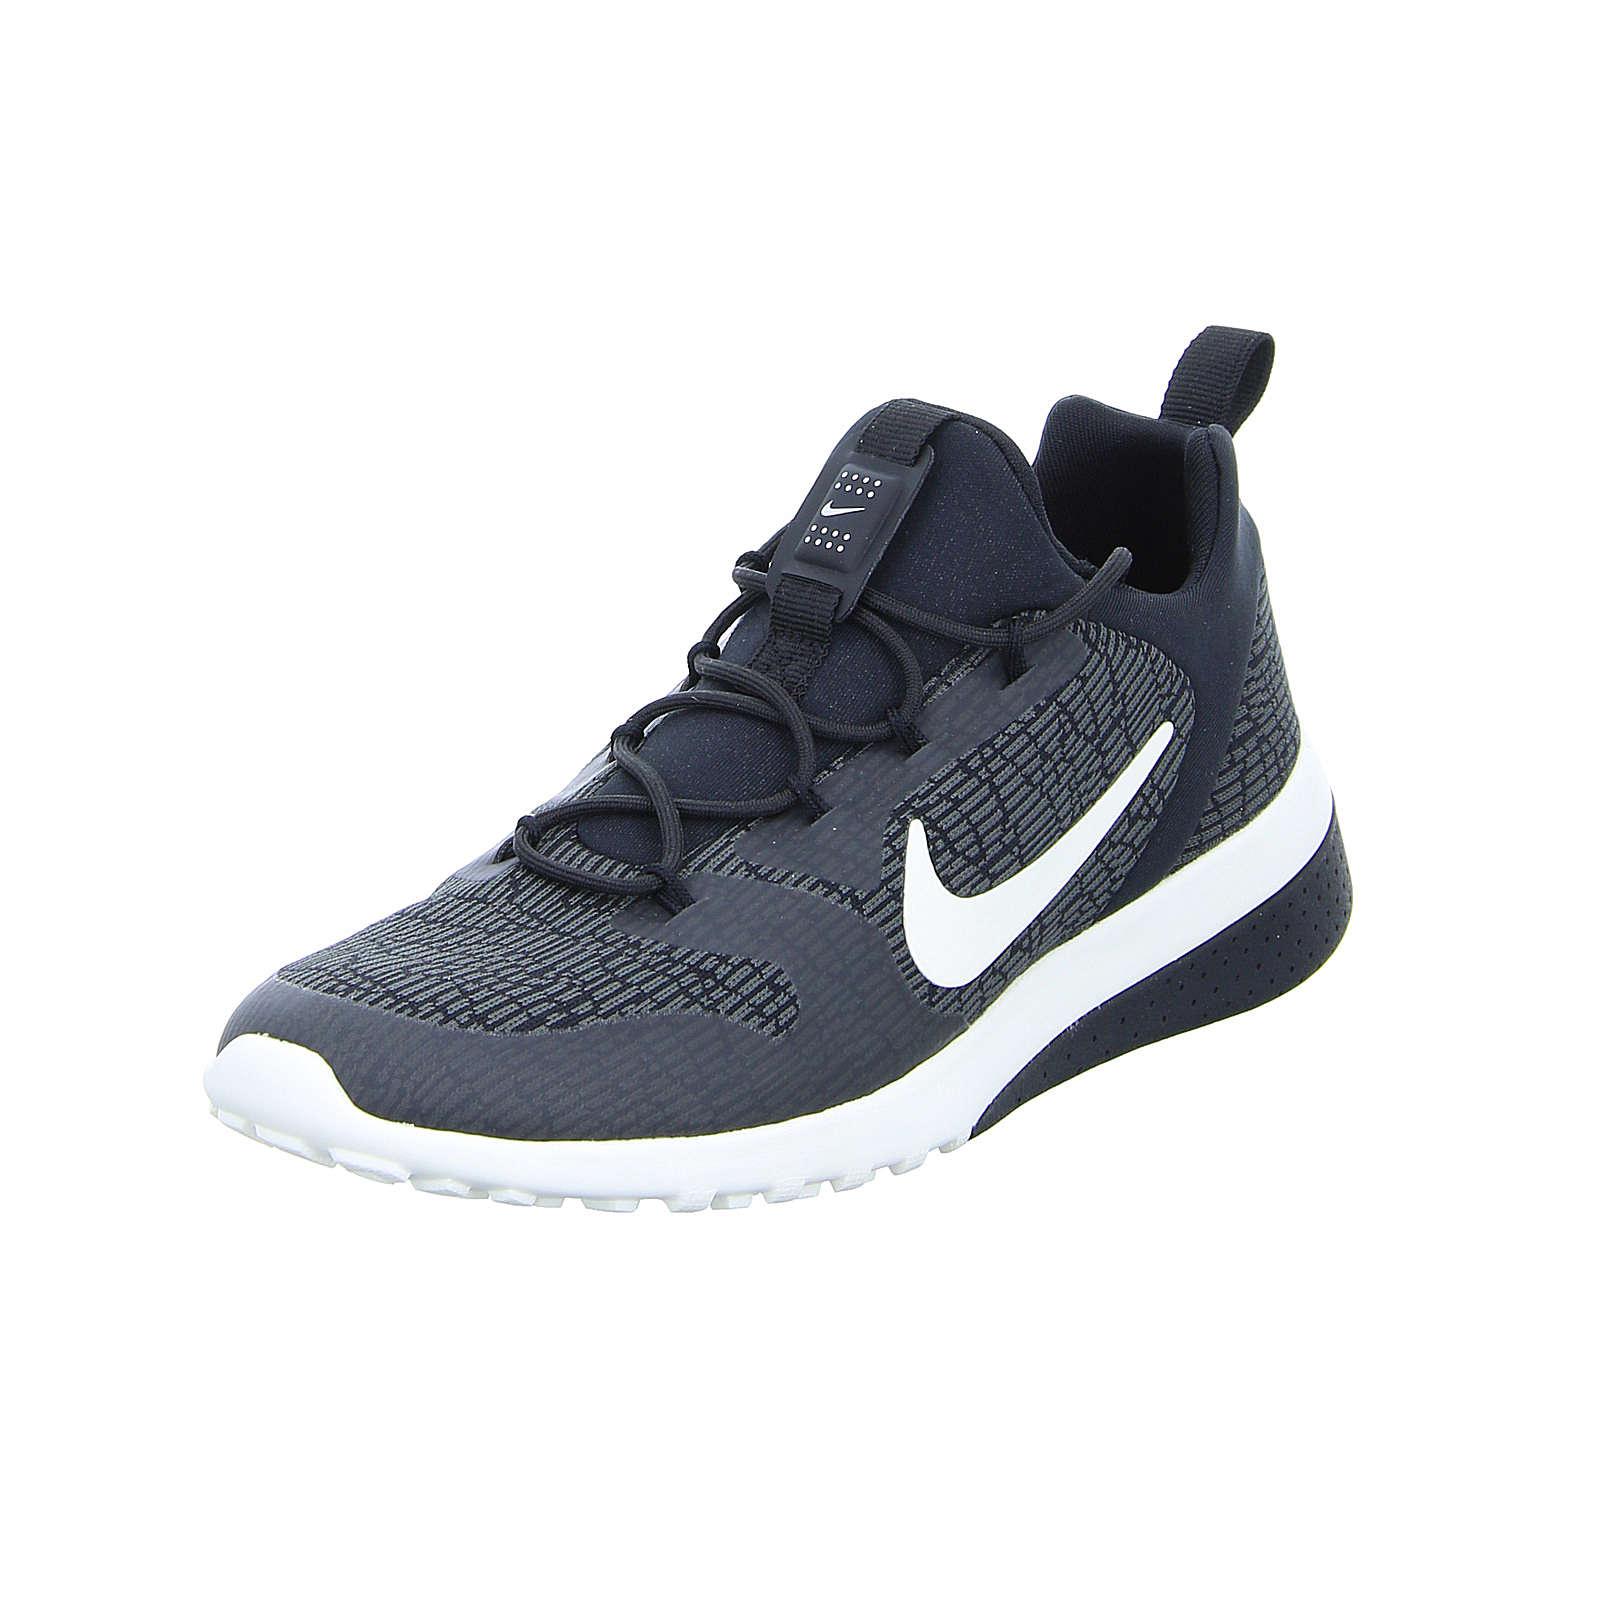 Nike Performance CK Racer Sneakers schwarz Damen Gr. 38